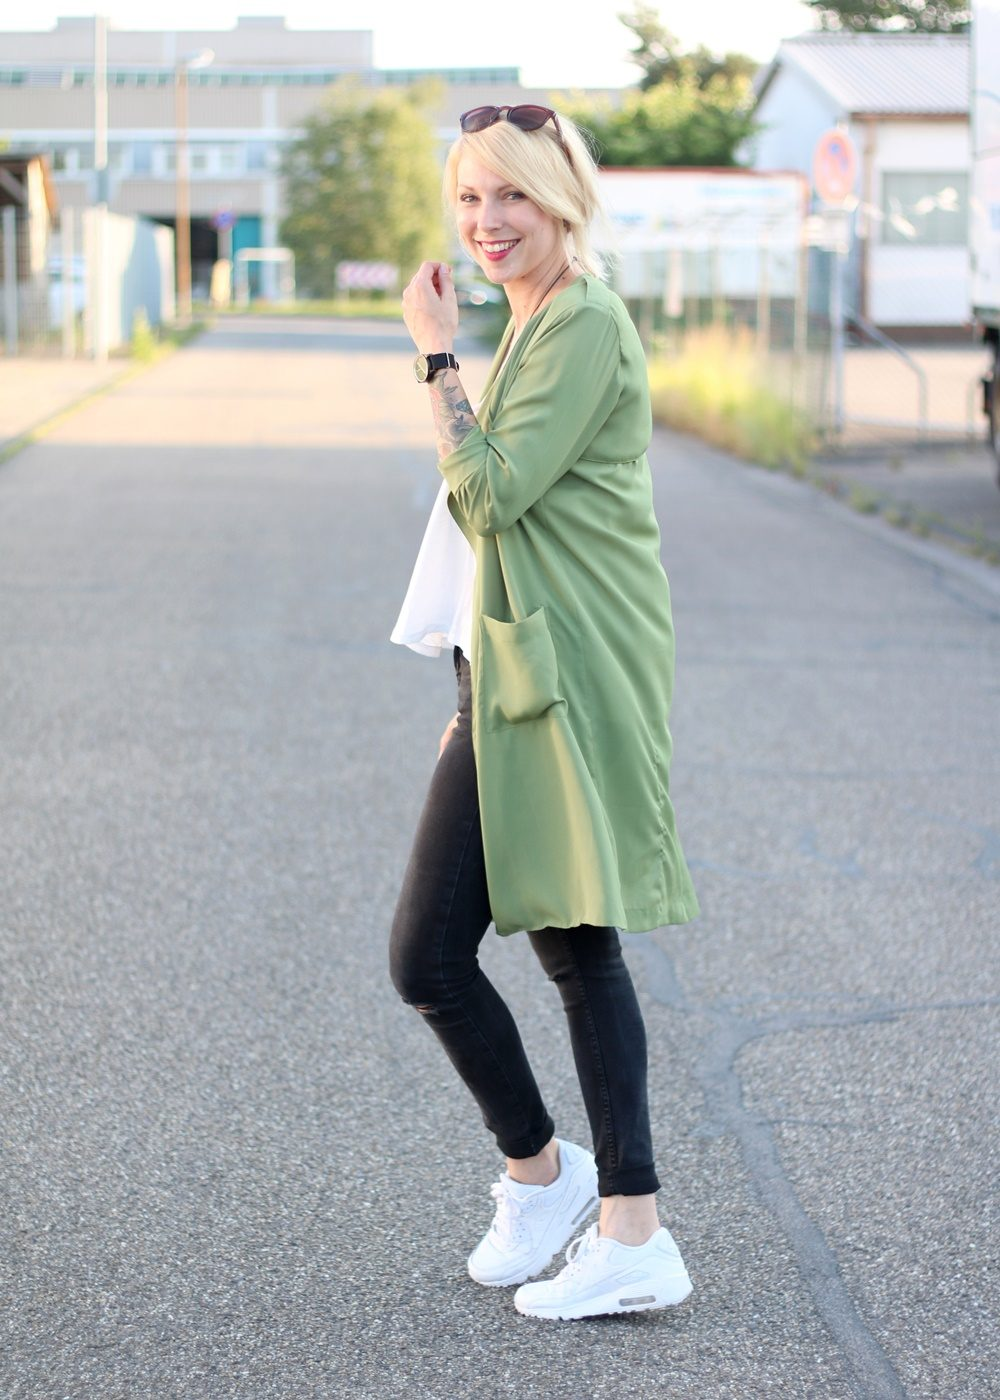 Fashionbloggerin Karlsruhe Outfit Parka Nike Air Max Sonnenbrille (4)